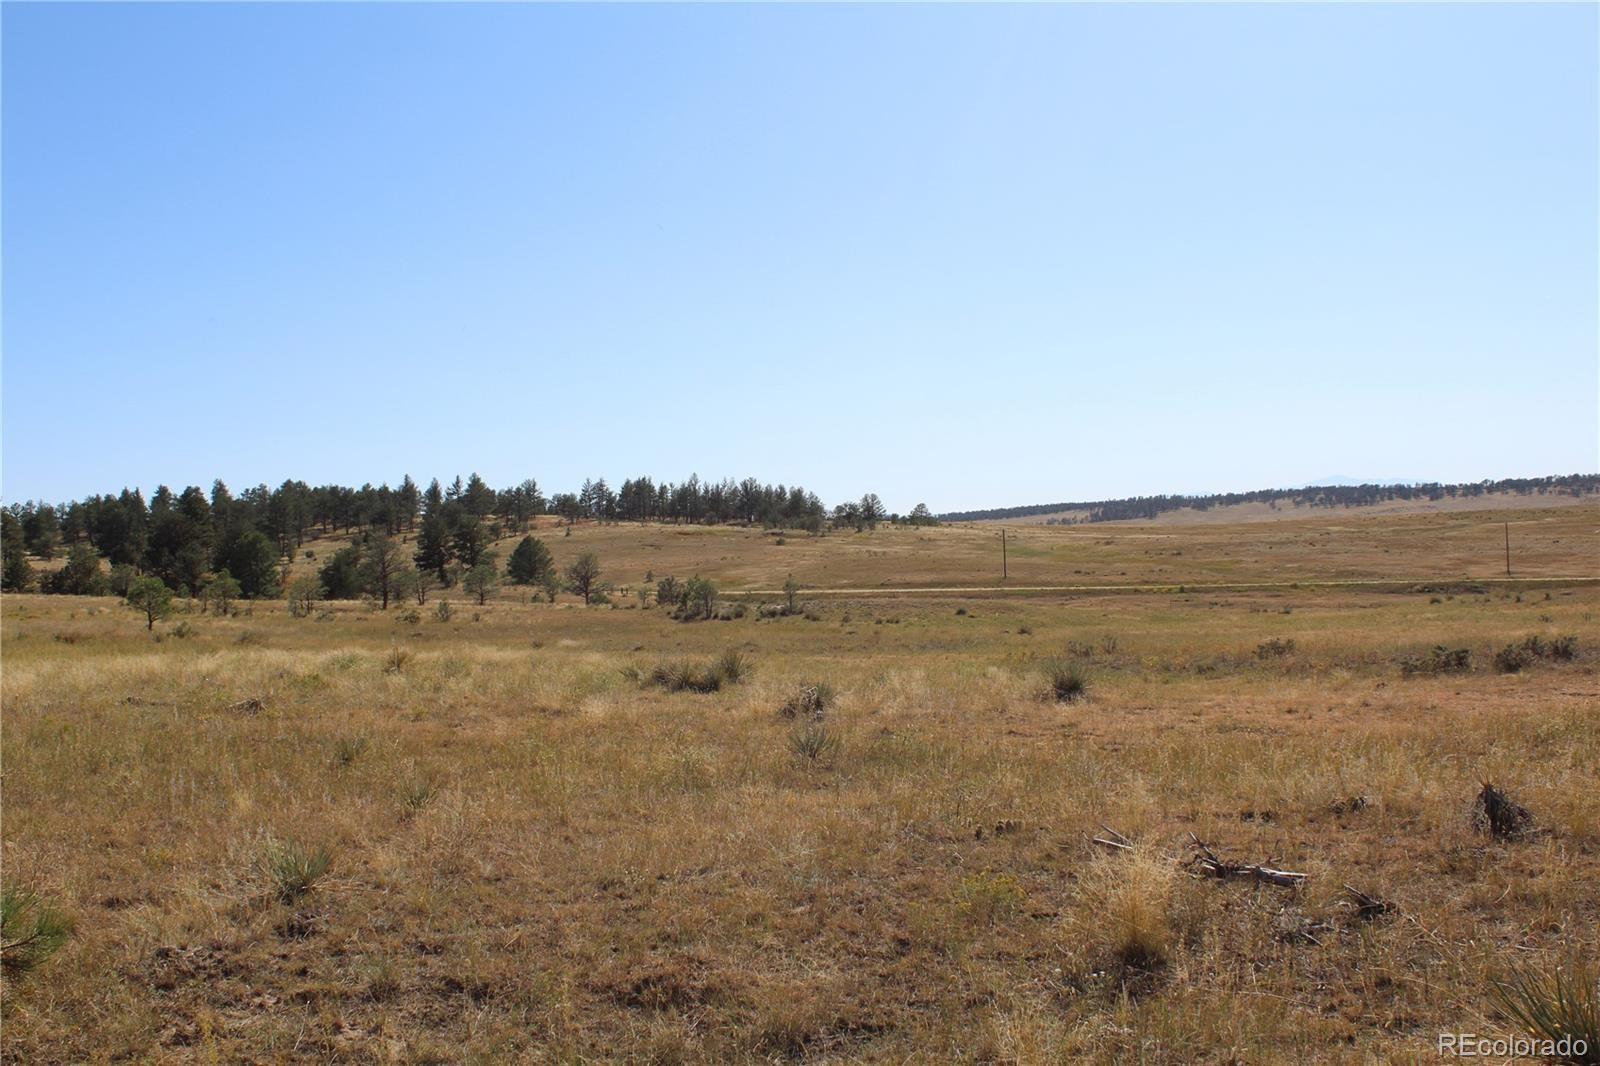 MLS# 2877174 - 14 - Cattle Circle, Kiowa, CO 80117